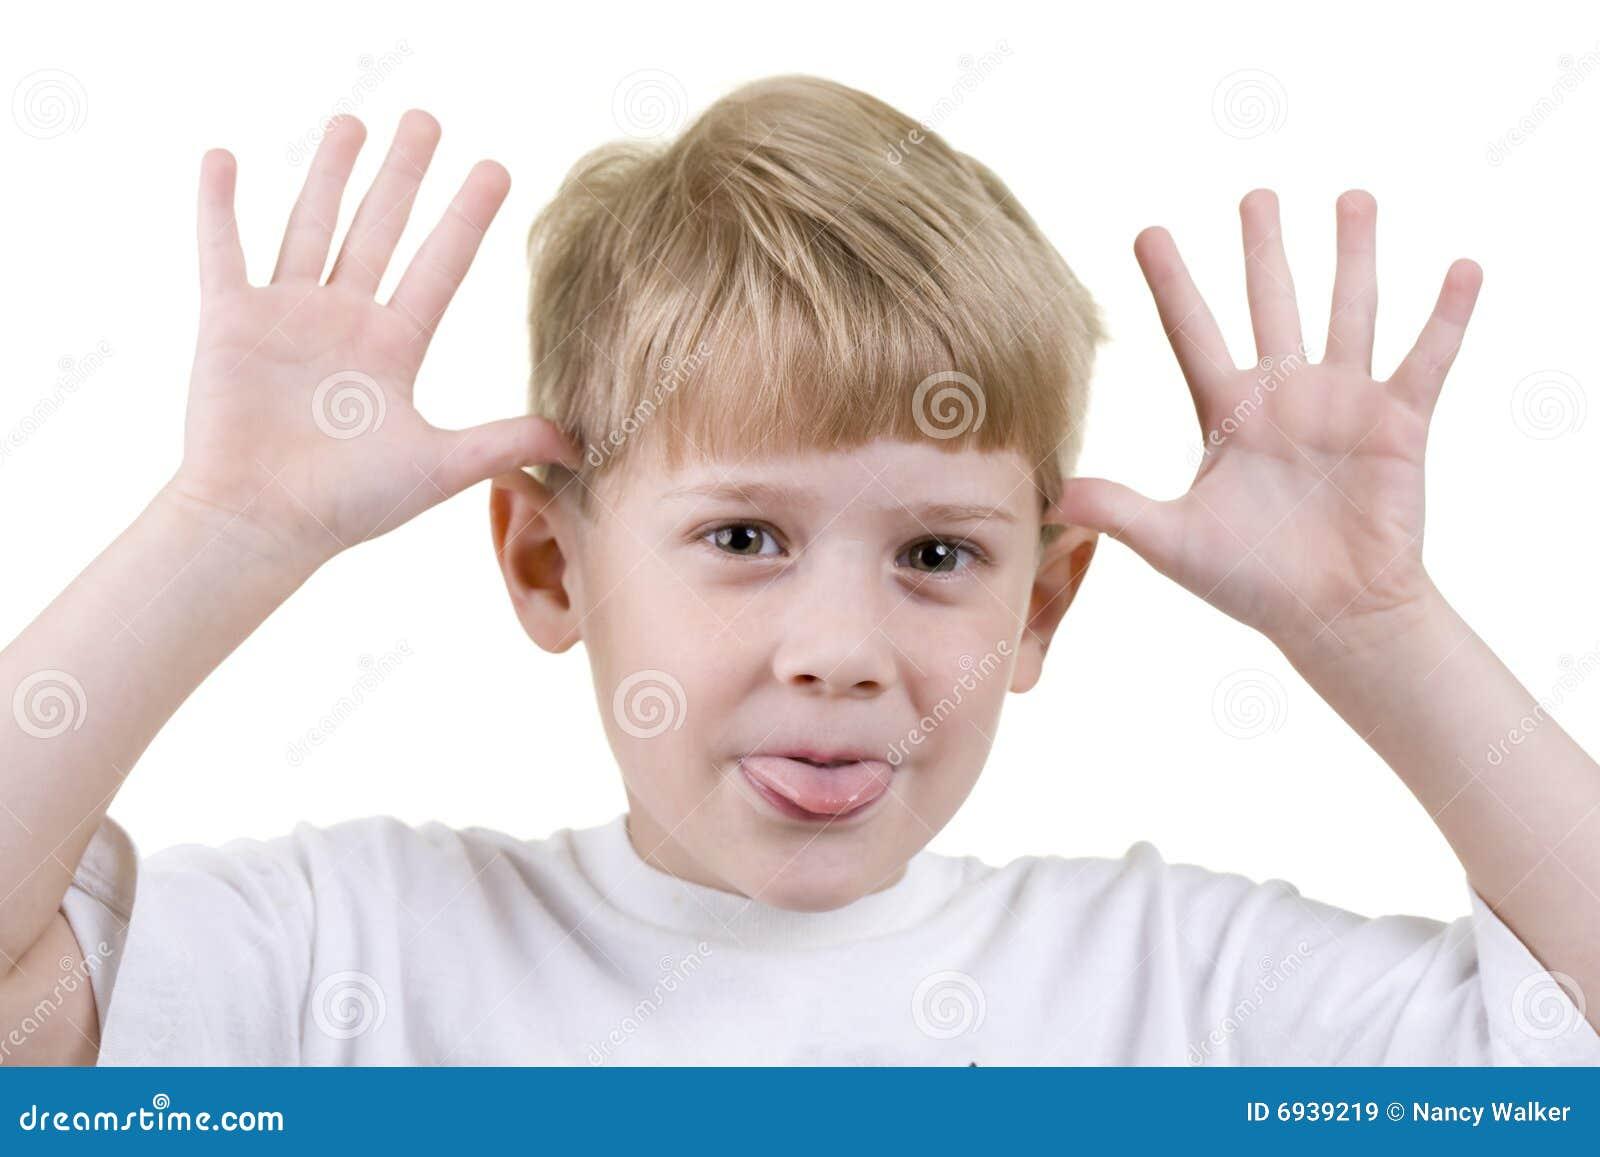 Headshot of a Child